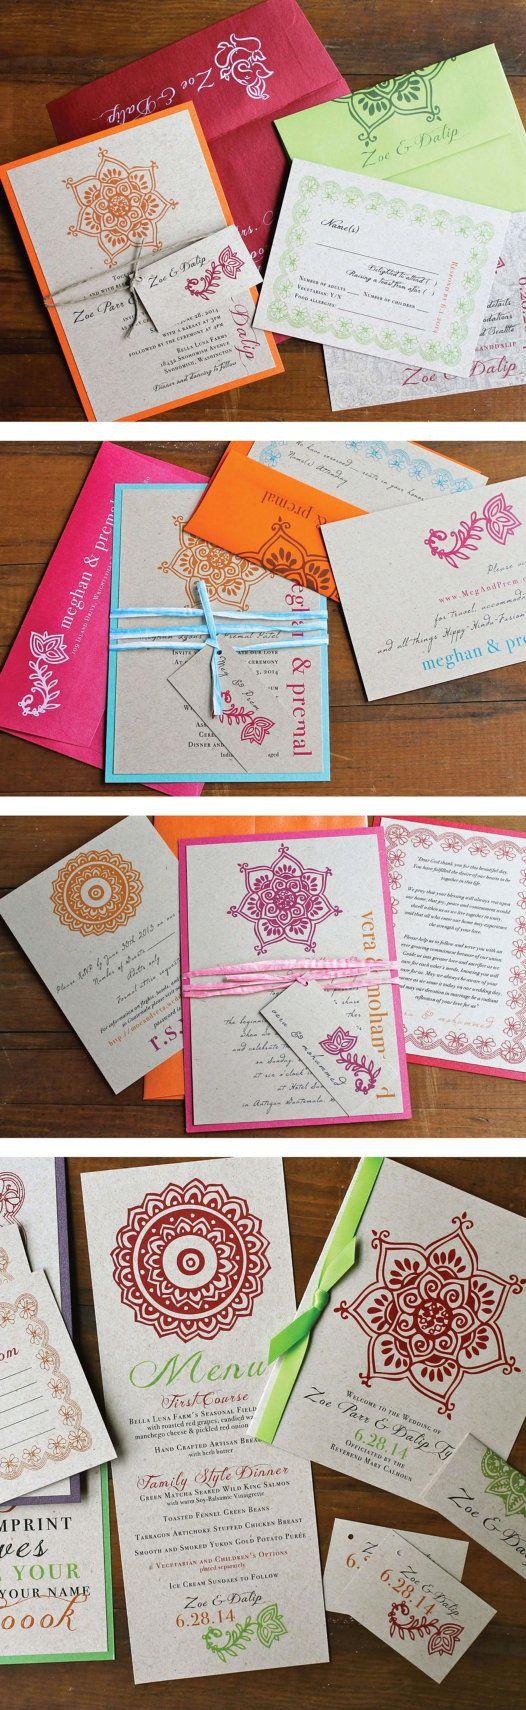 Modern Indian Wedding Invitations - Beacon Lane - Favorite Client Customizations!